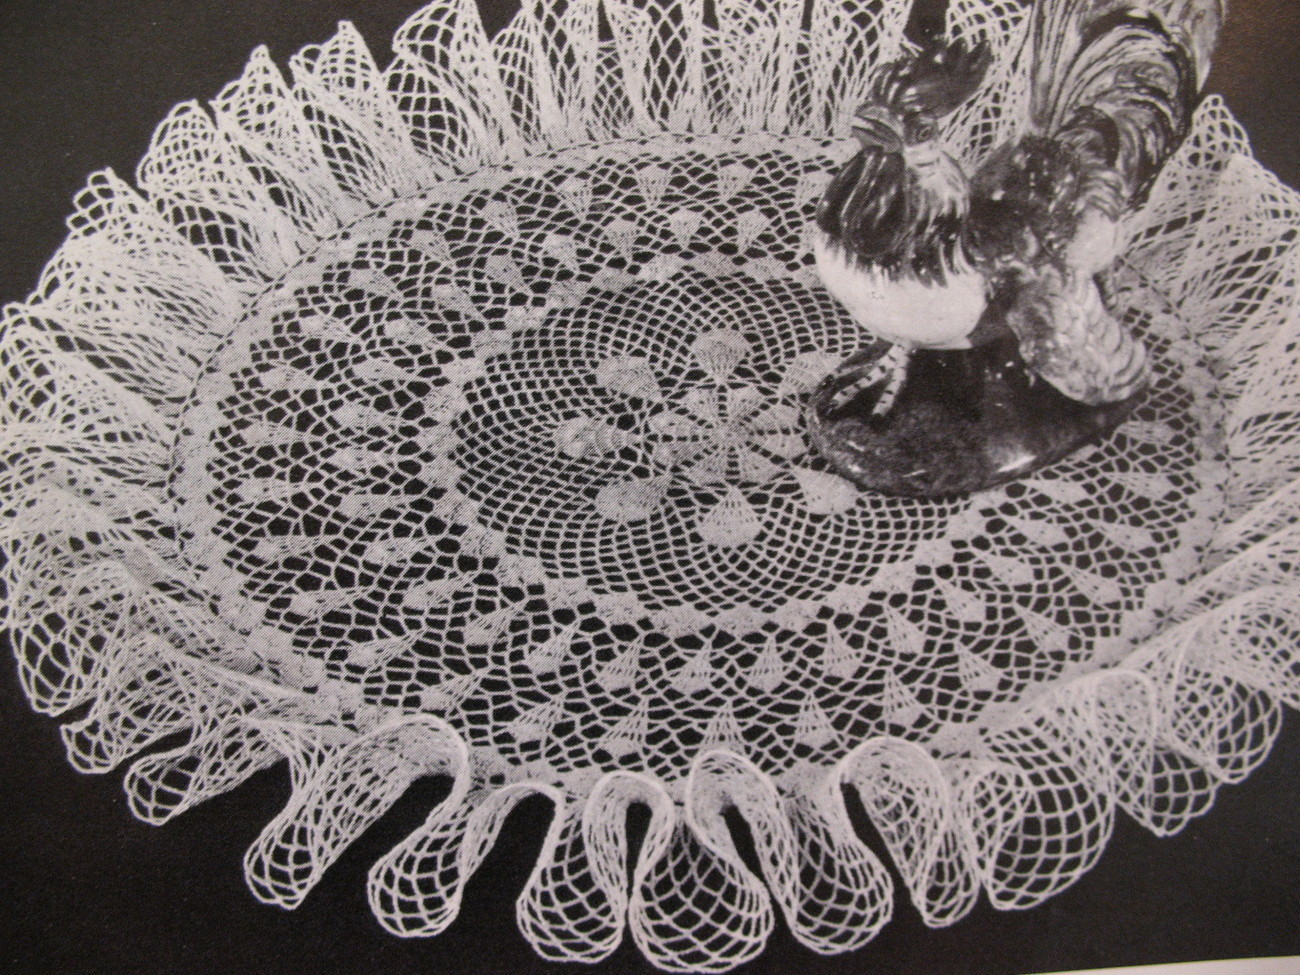 Vintage Ruffled Doilies Doily Crochet Pattern Booklet